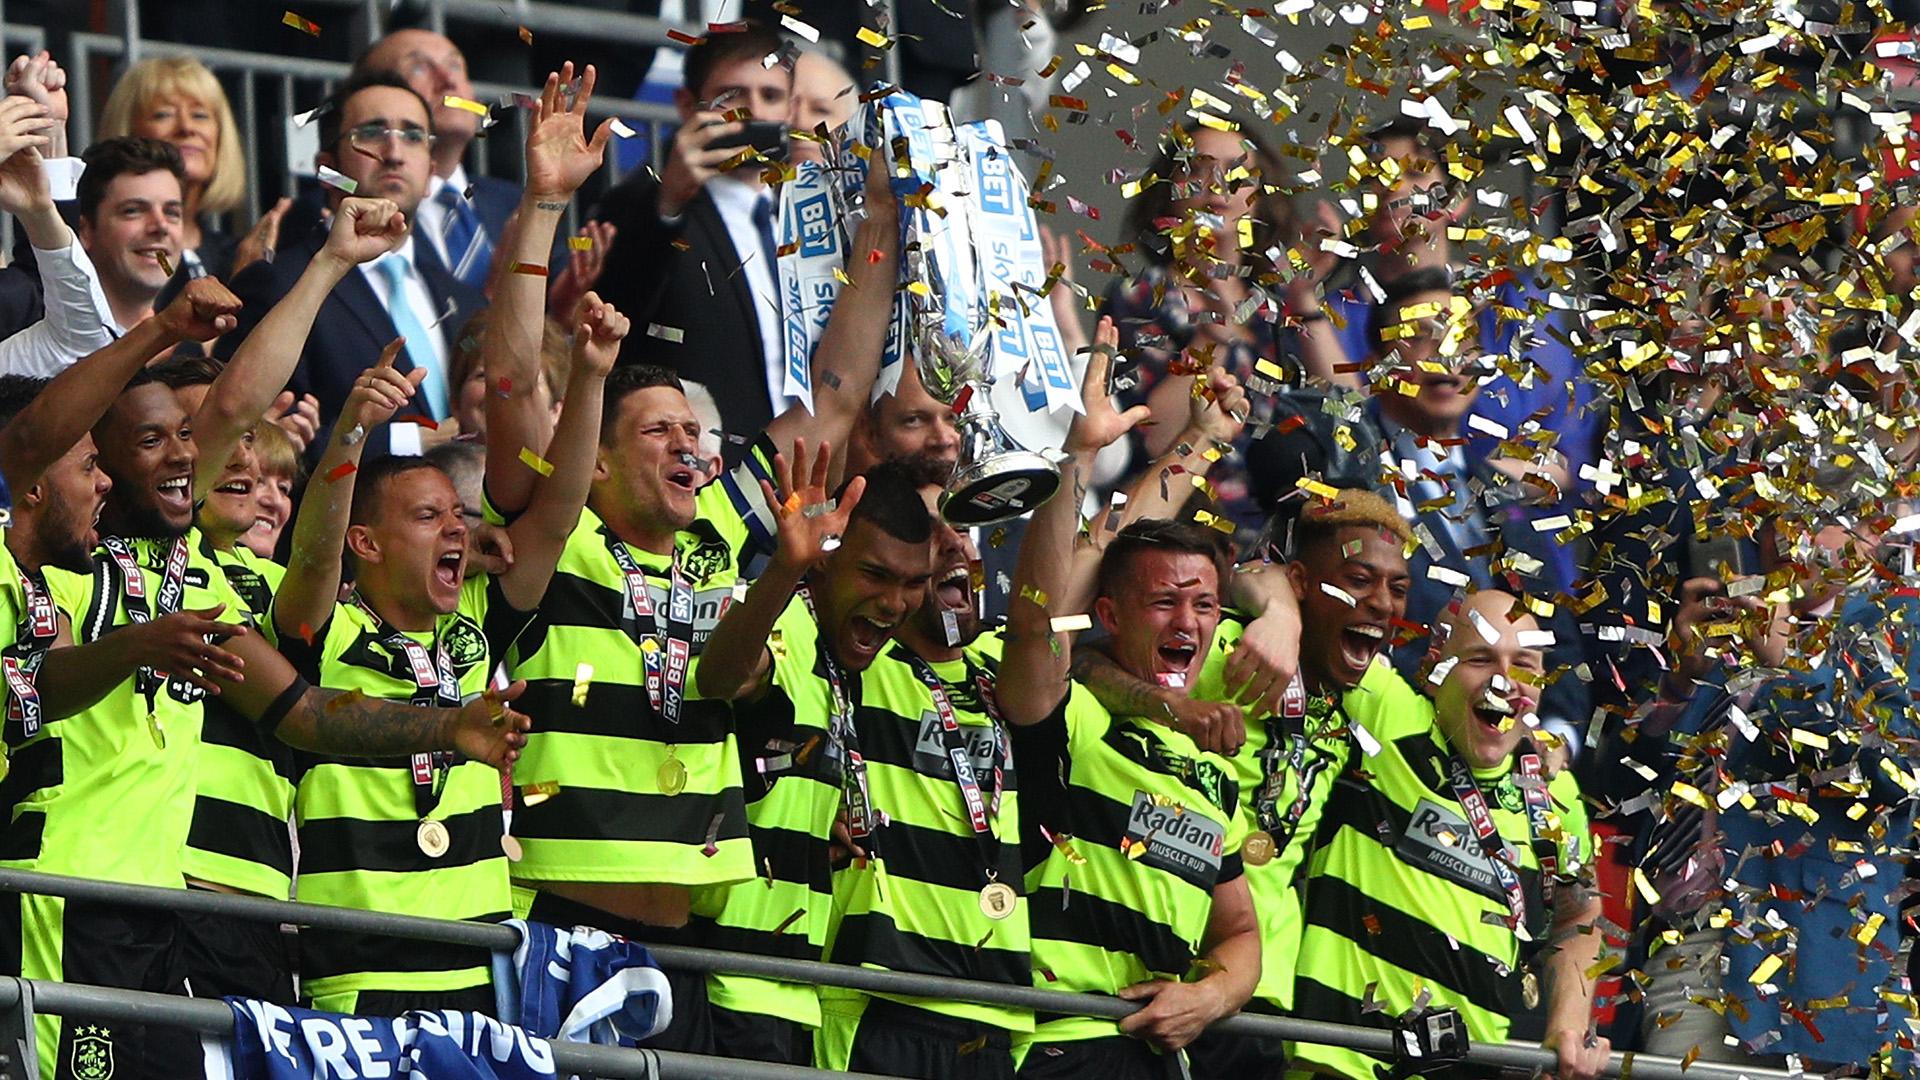 Huddersfield-town_1vv6e5o7phbzt167nx5w4wbh5y